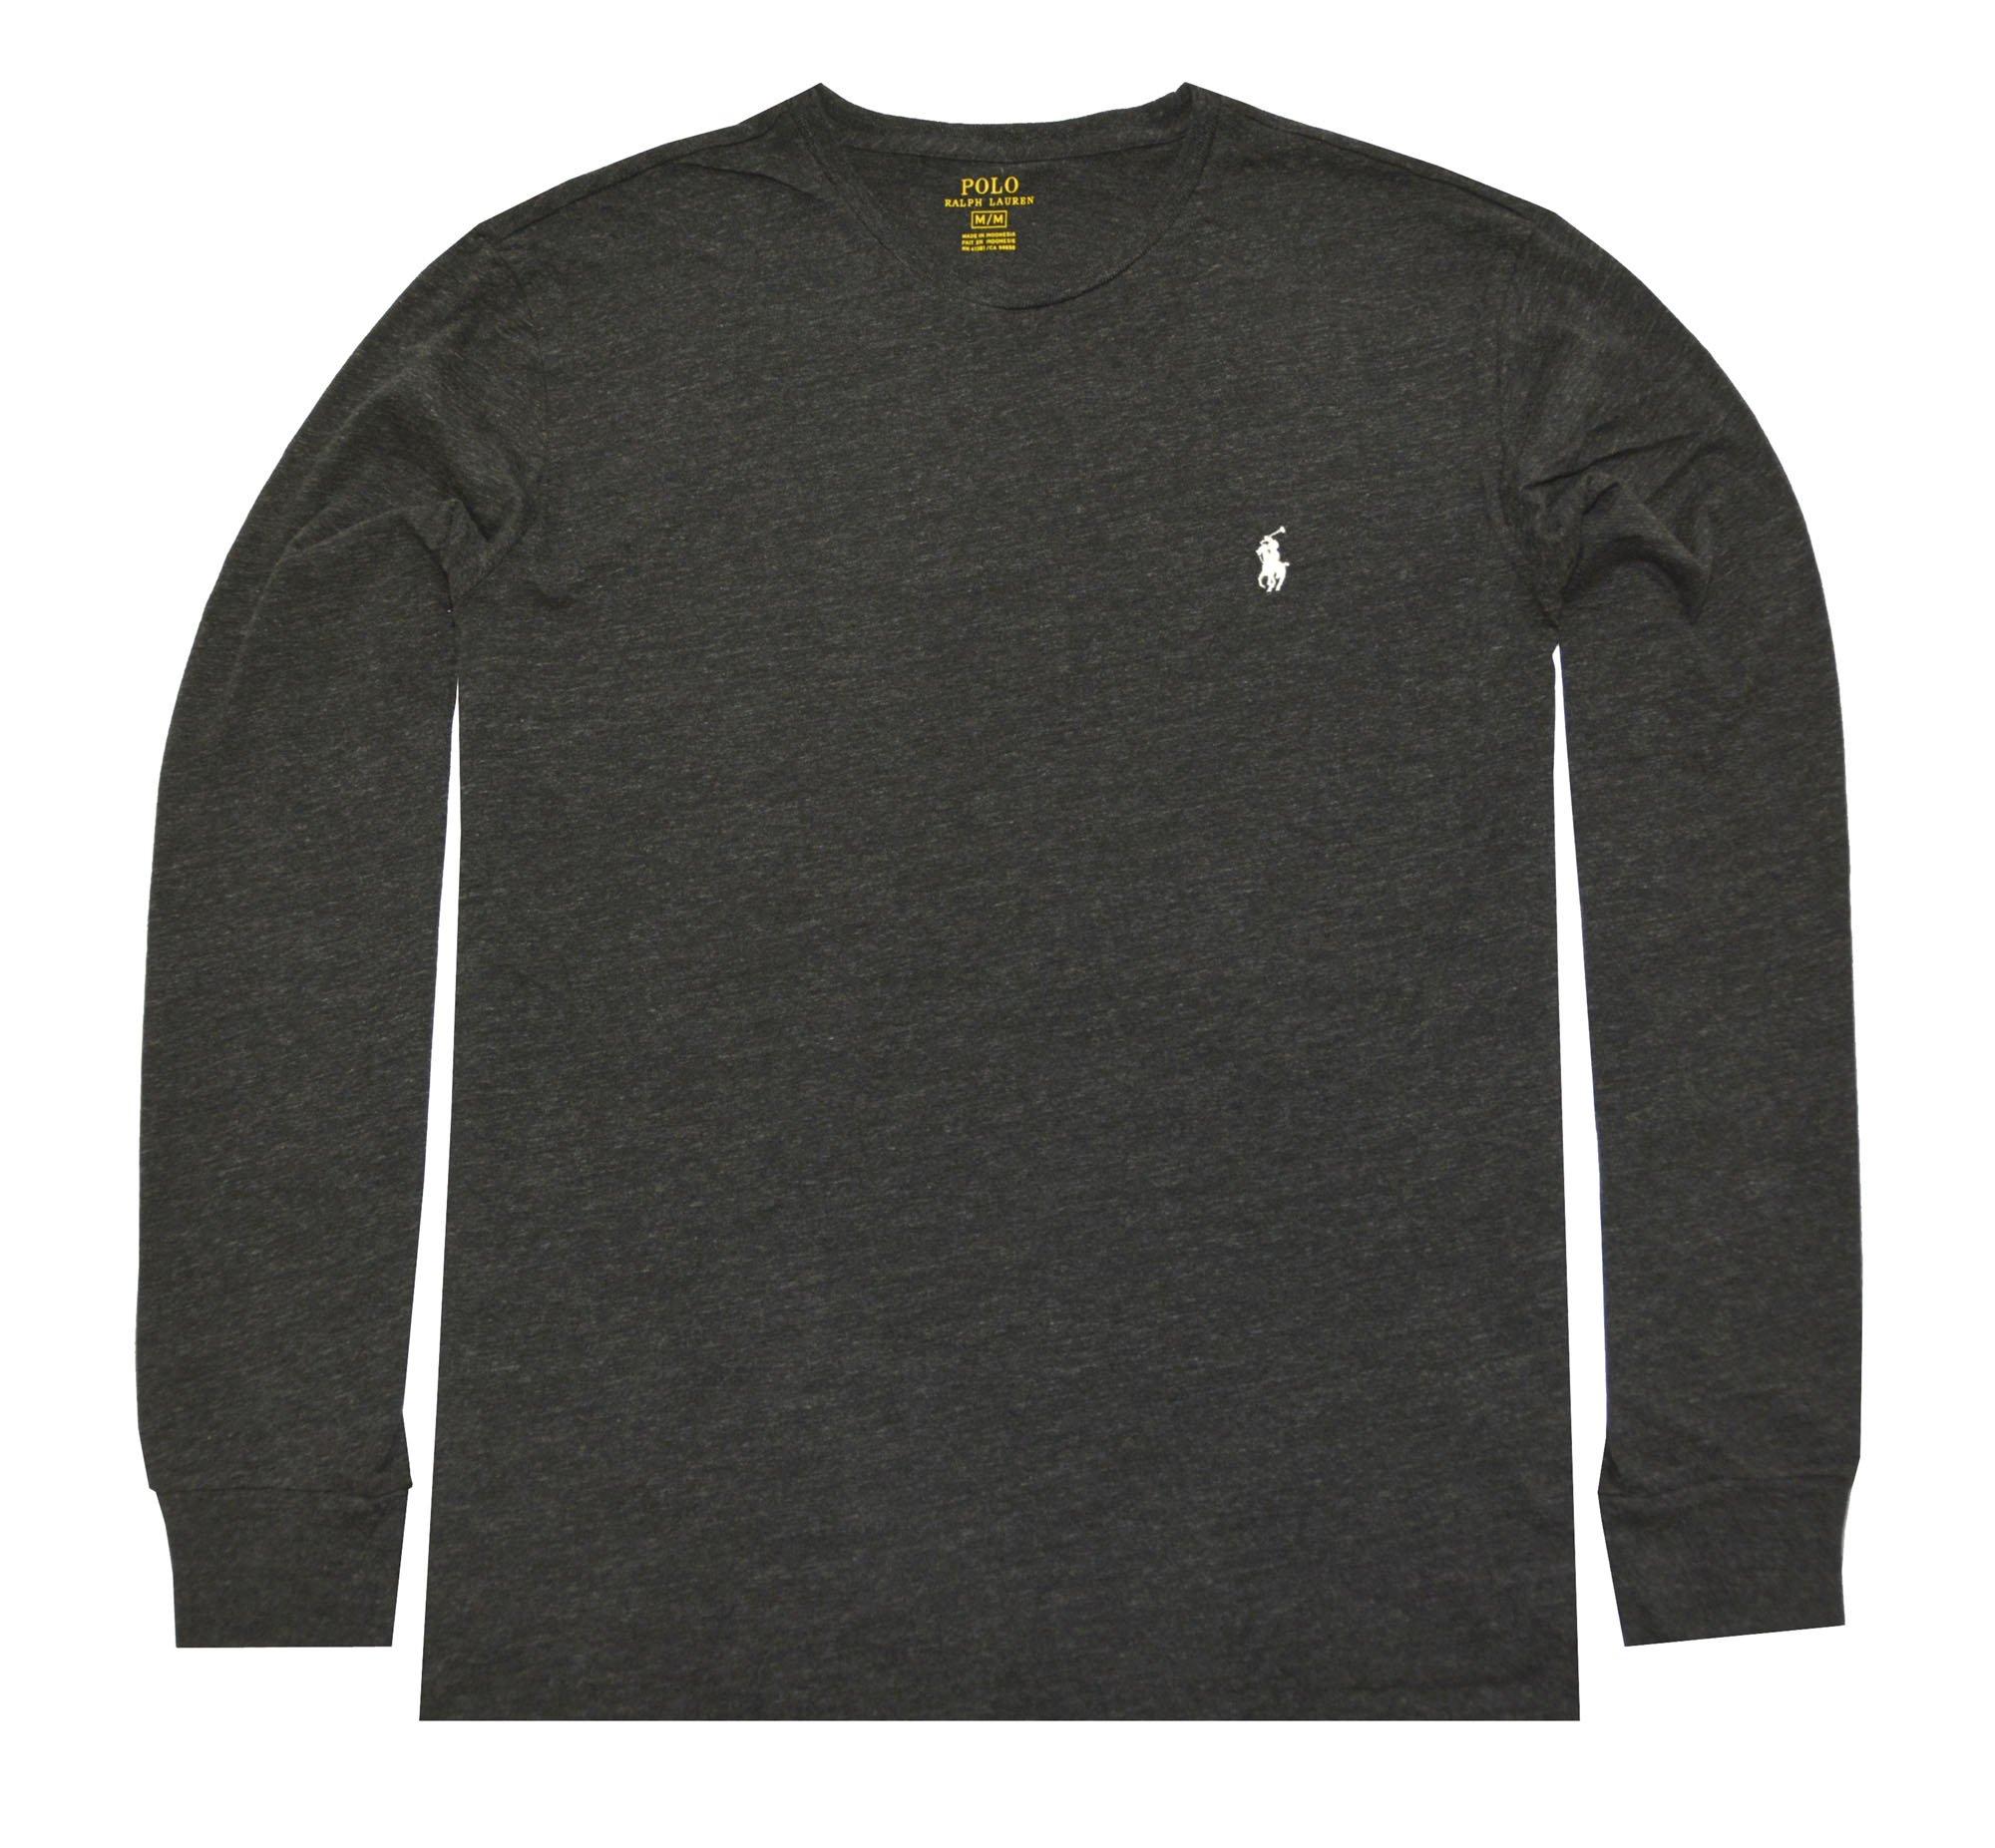 Polo Ralph Lauren Men's Long Sleeve Pony Logo T-Shirt - X-Large - Black Charcoal